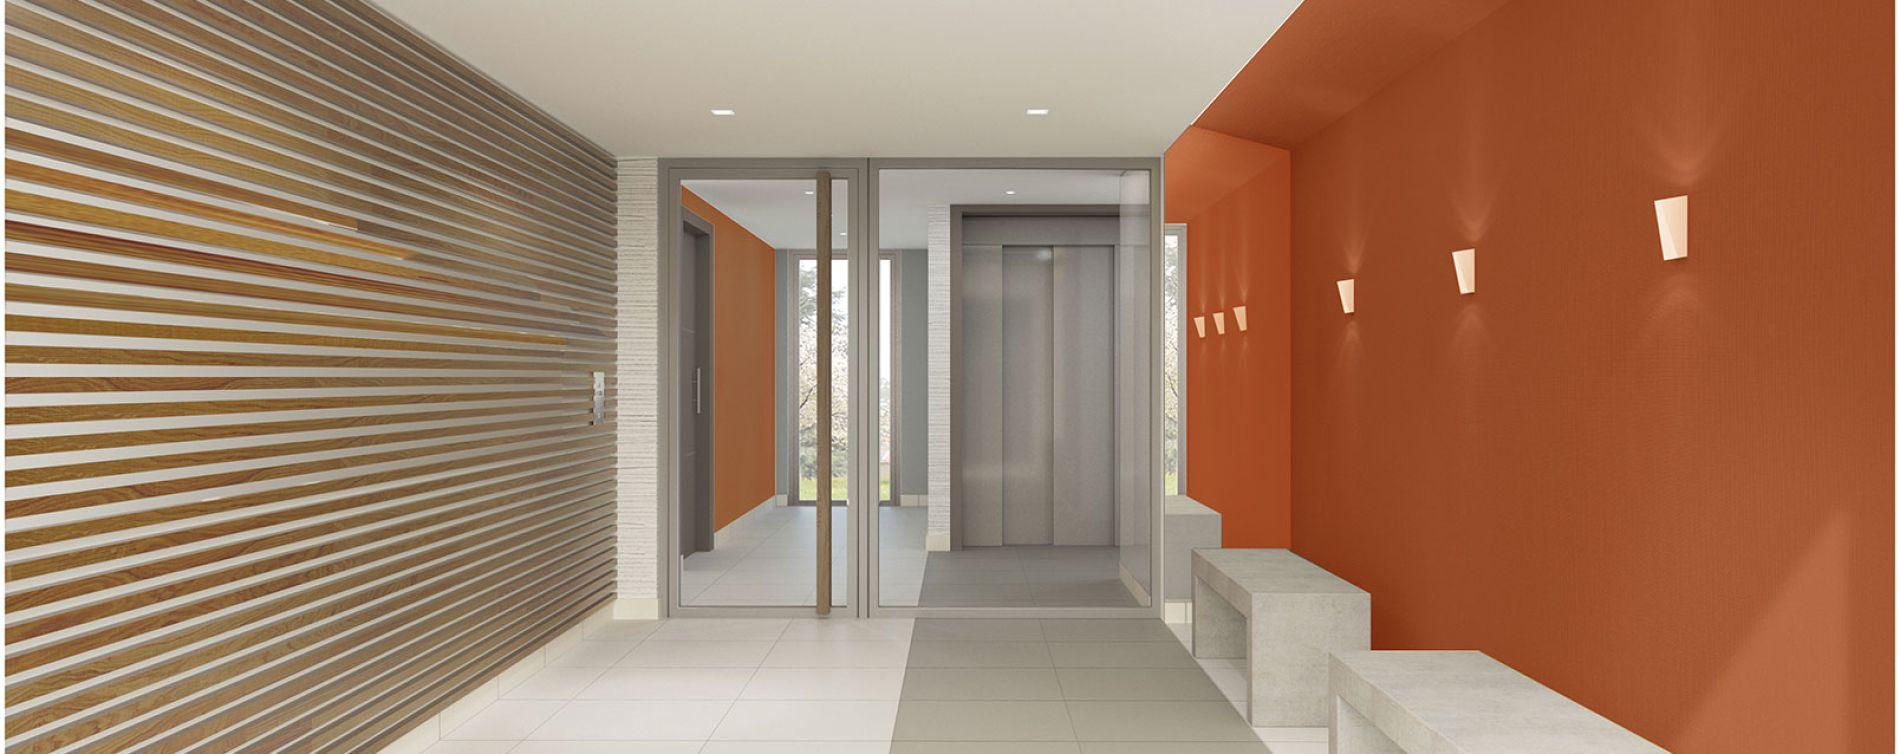 Grigny : programme immobilier neuve « Pastel » (4)